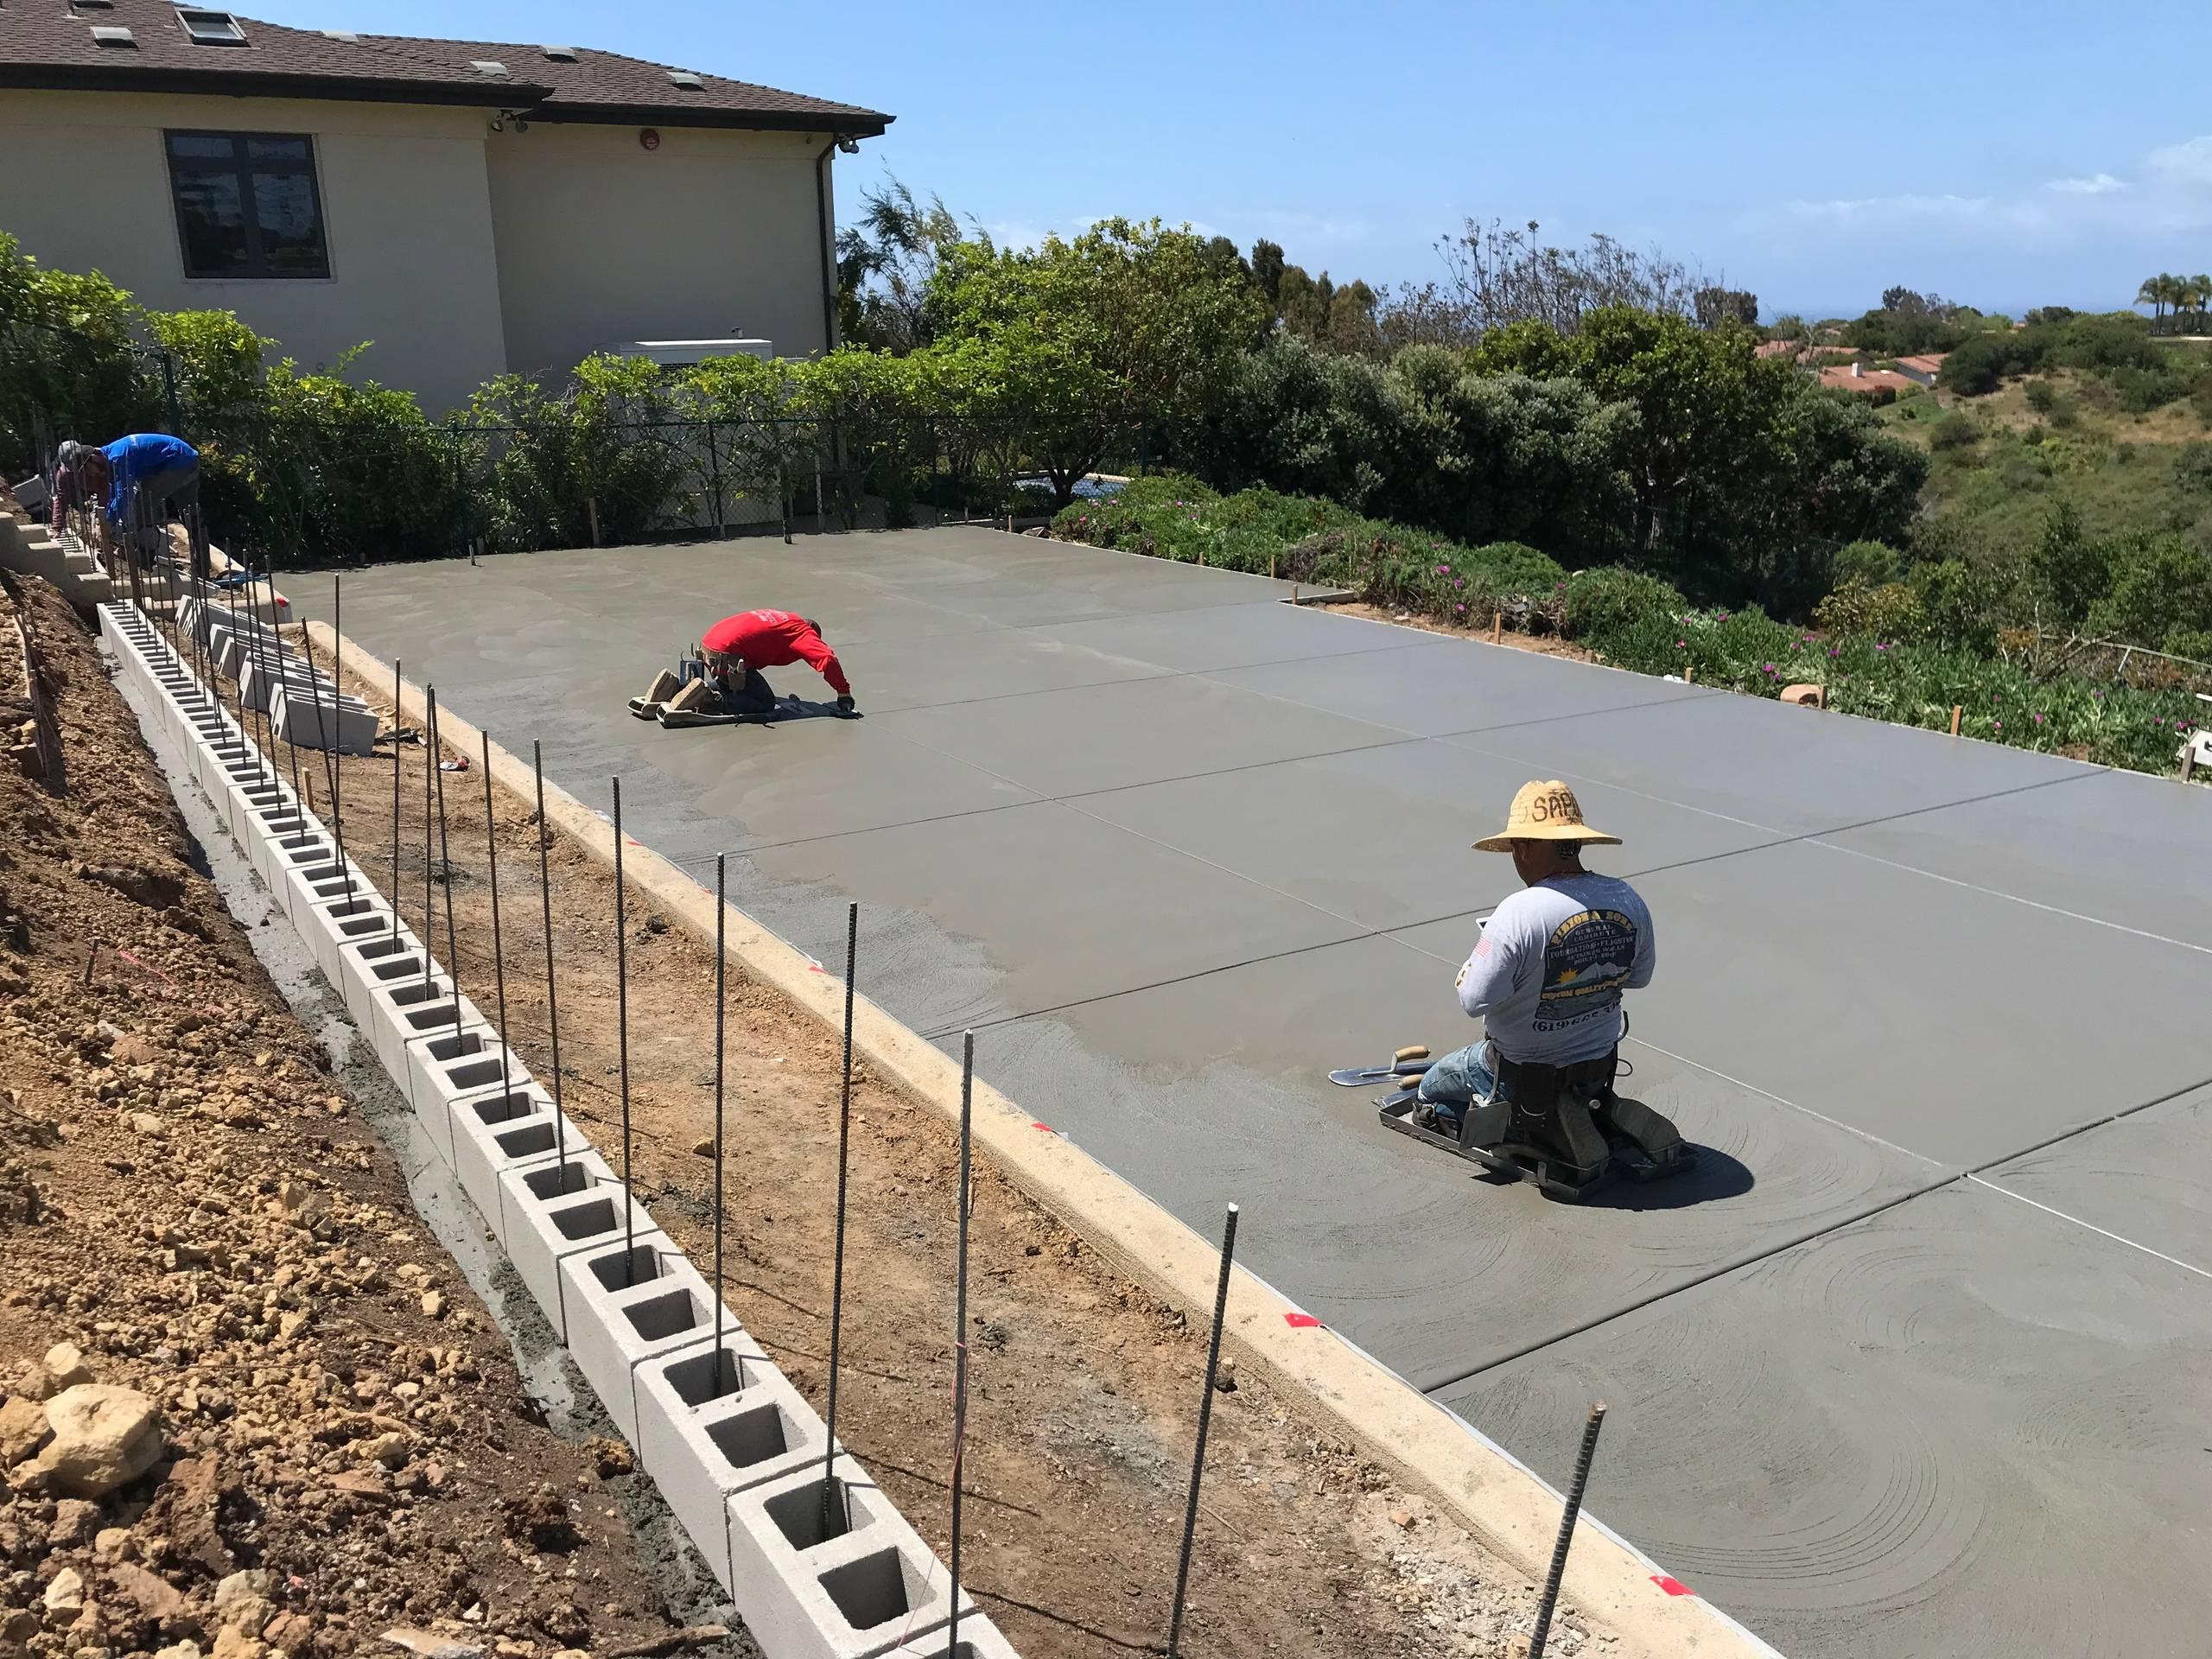 Large Concrete Slab in Backyard